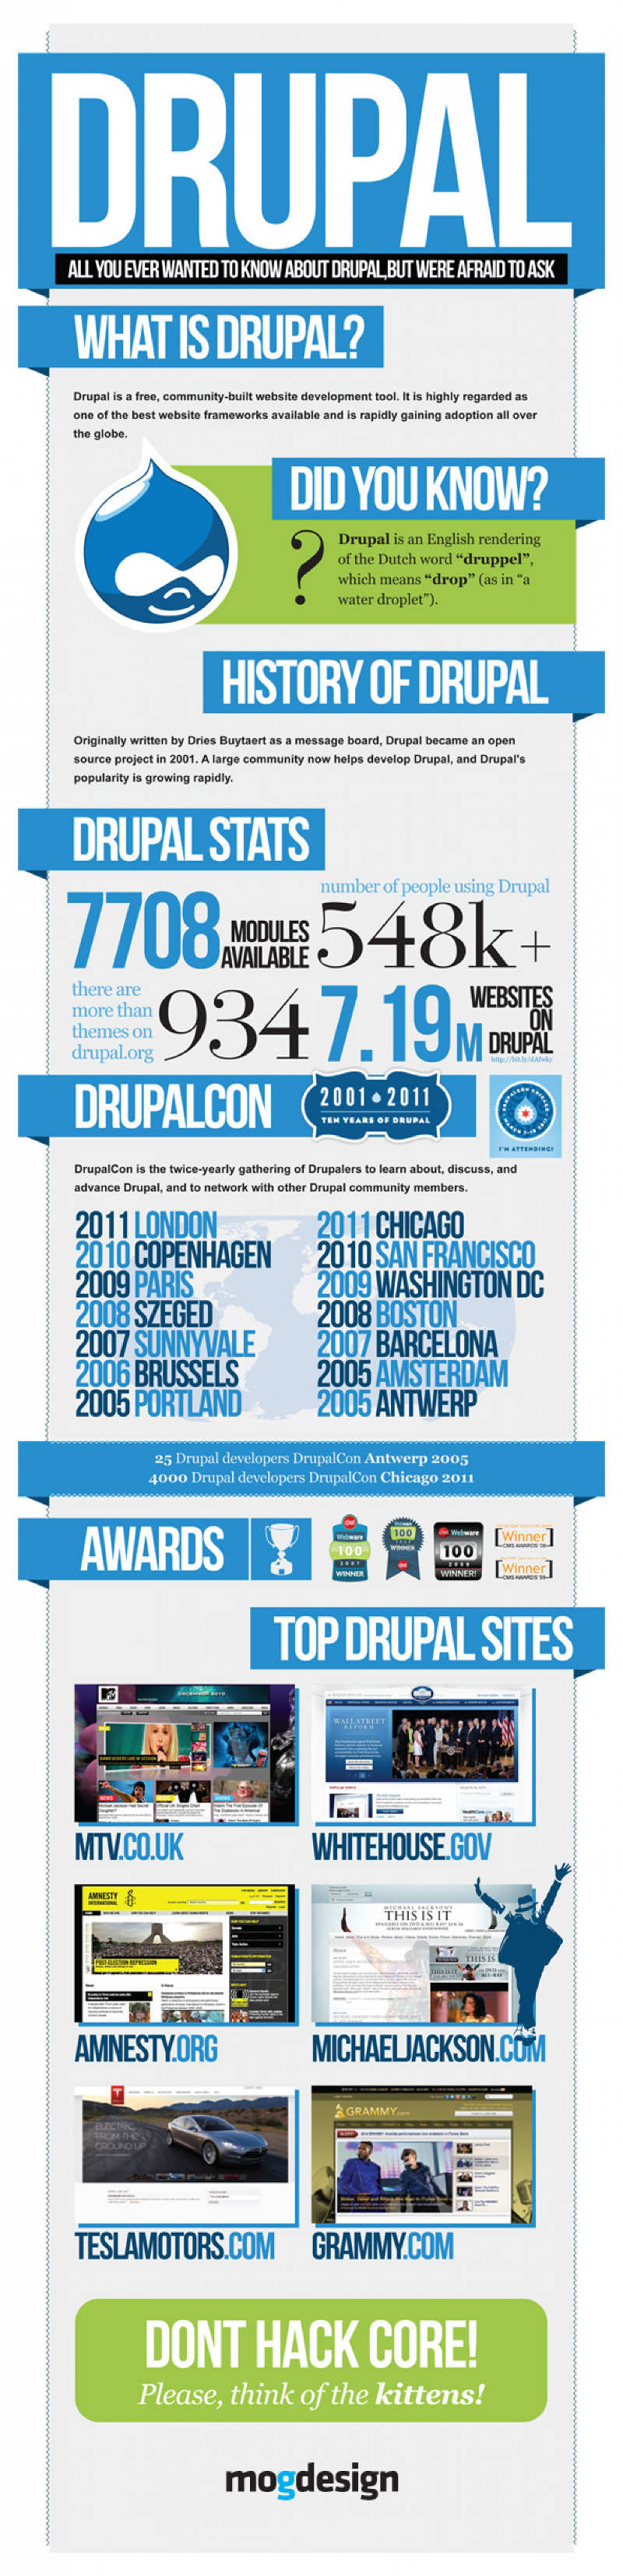 Facts About Drupal